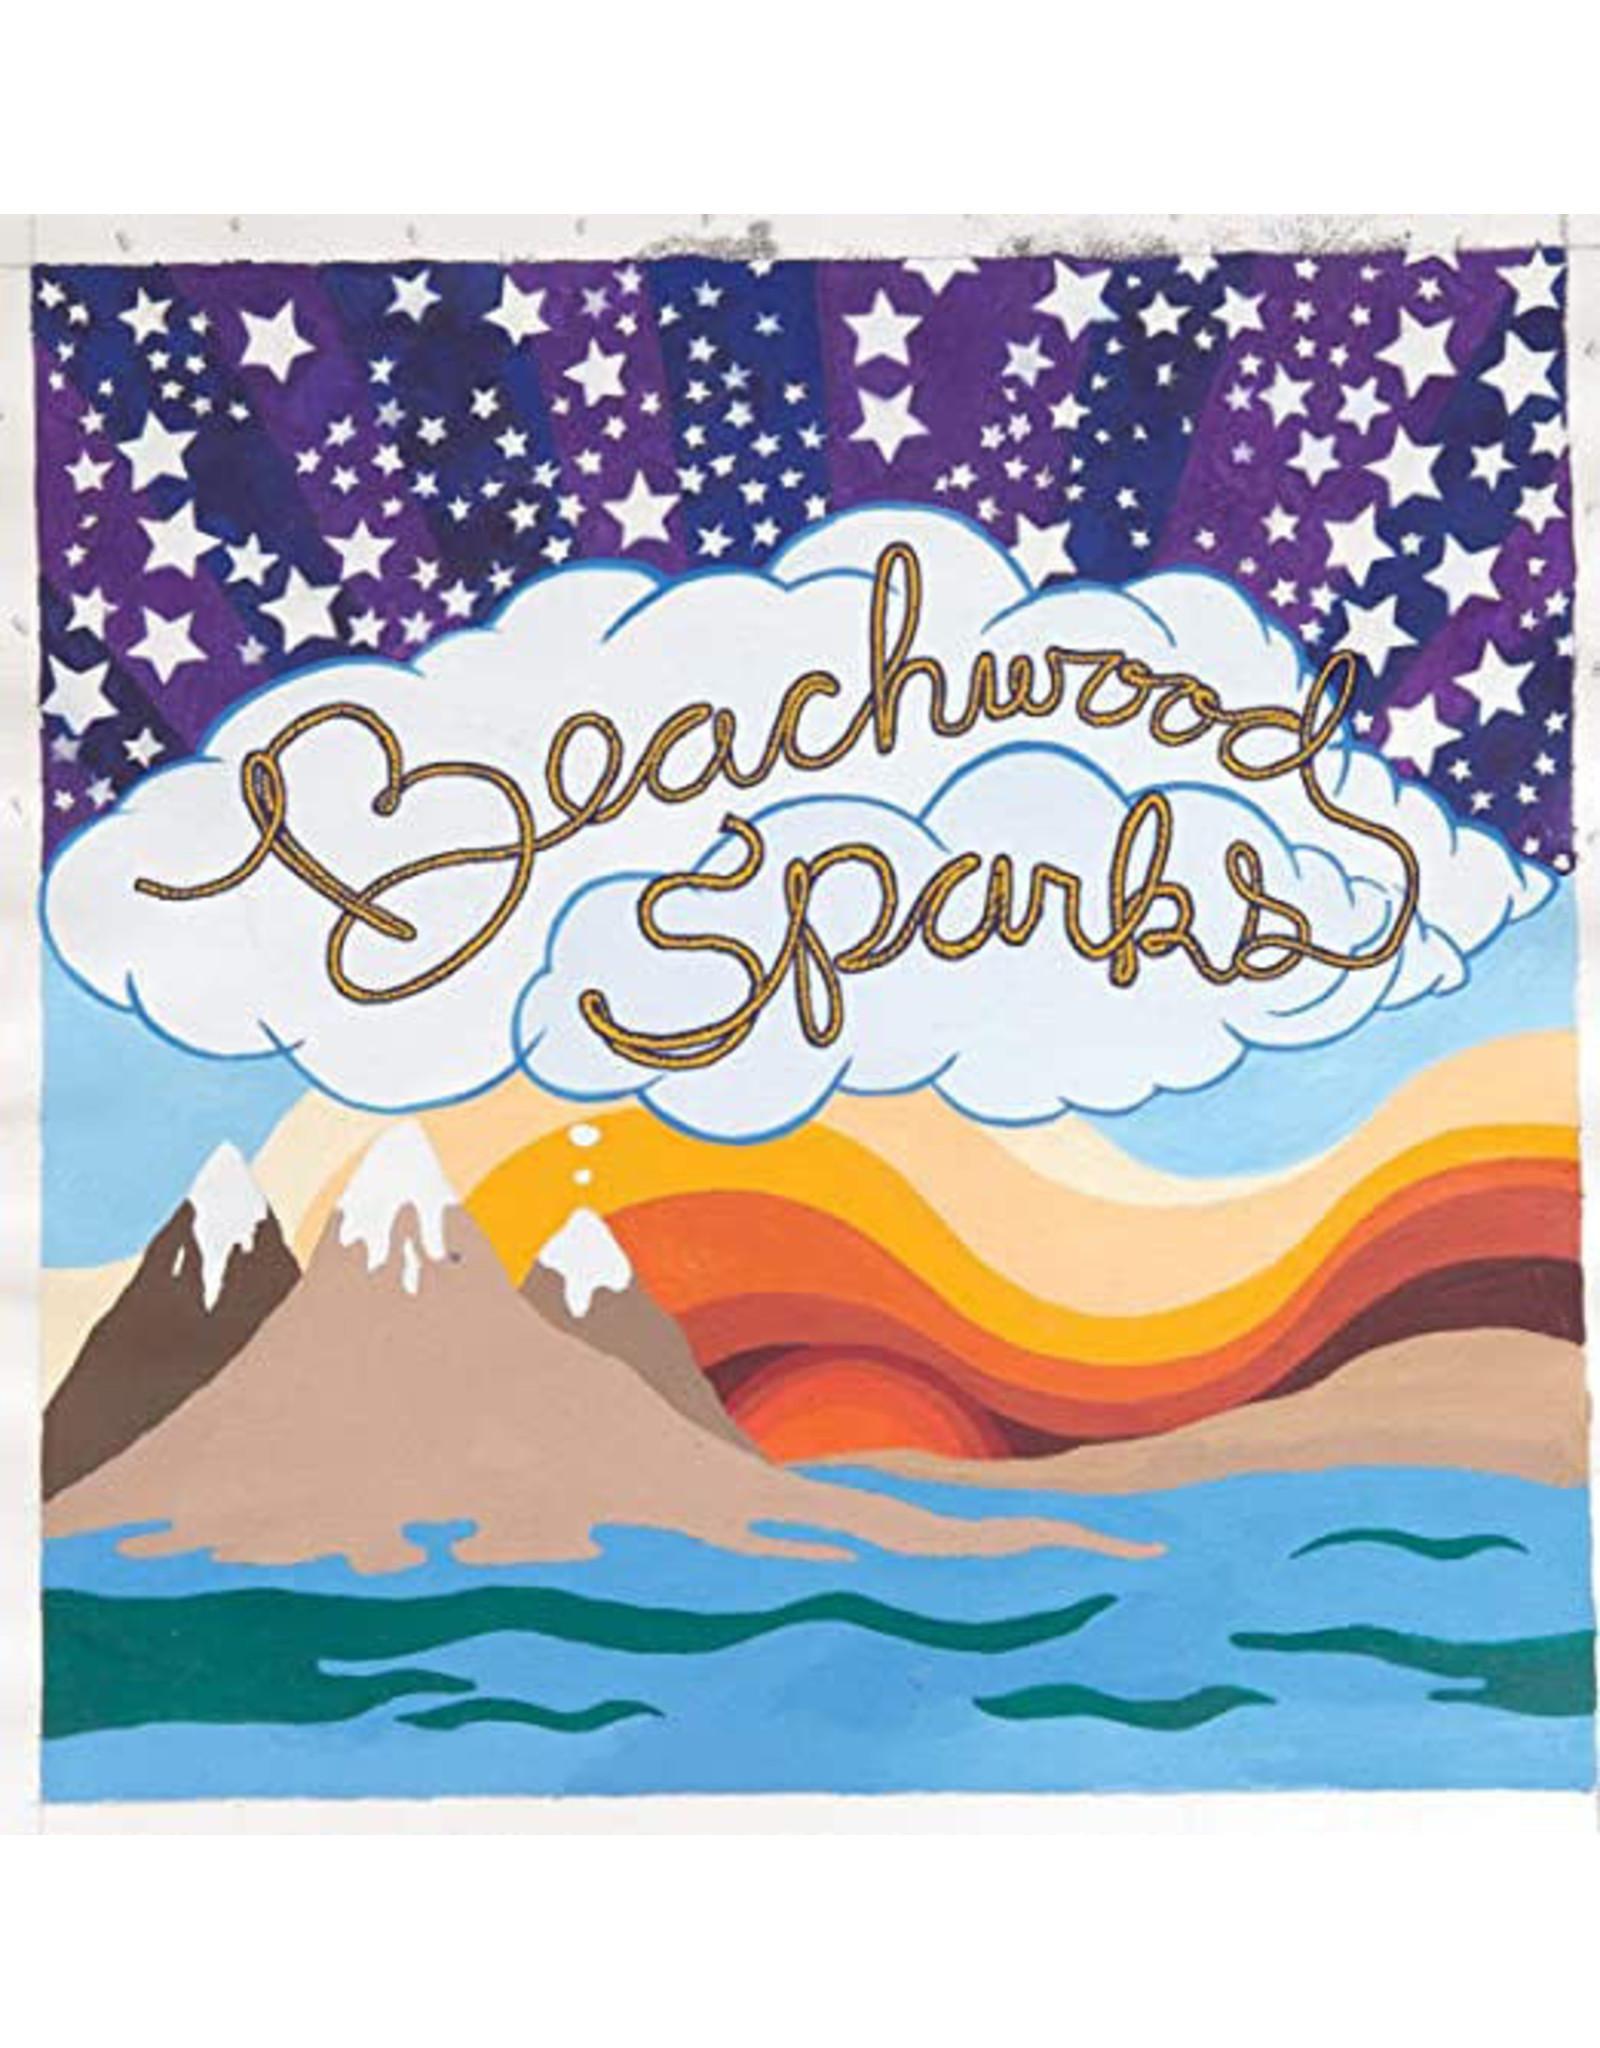 Beachwood Sparks - Beachwood Sparks 2LP (20th Anniversary)